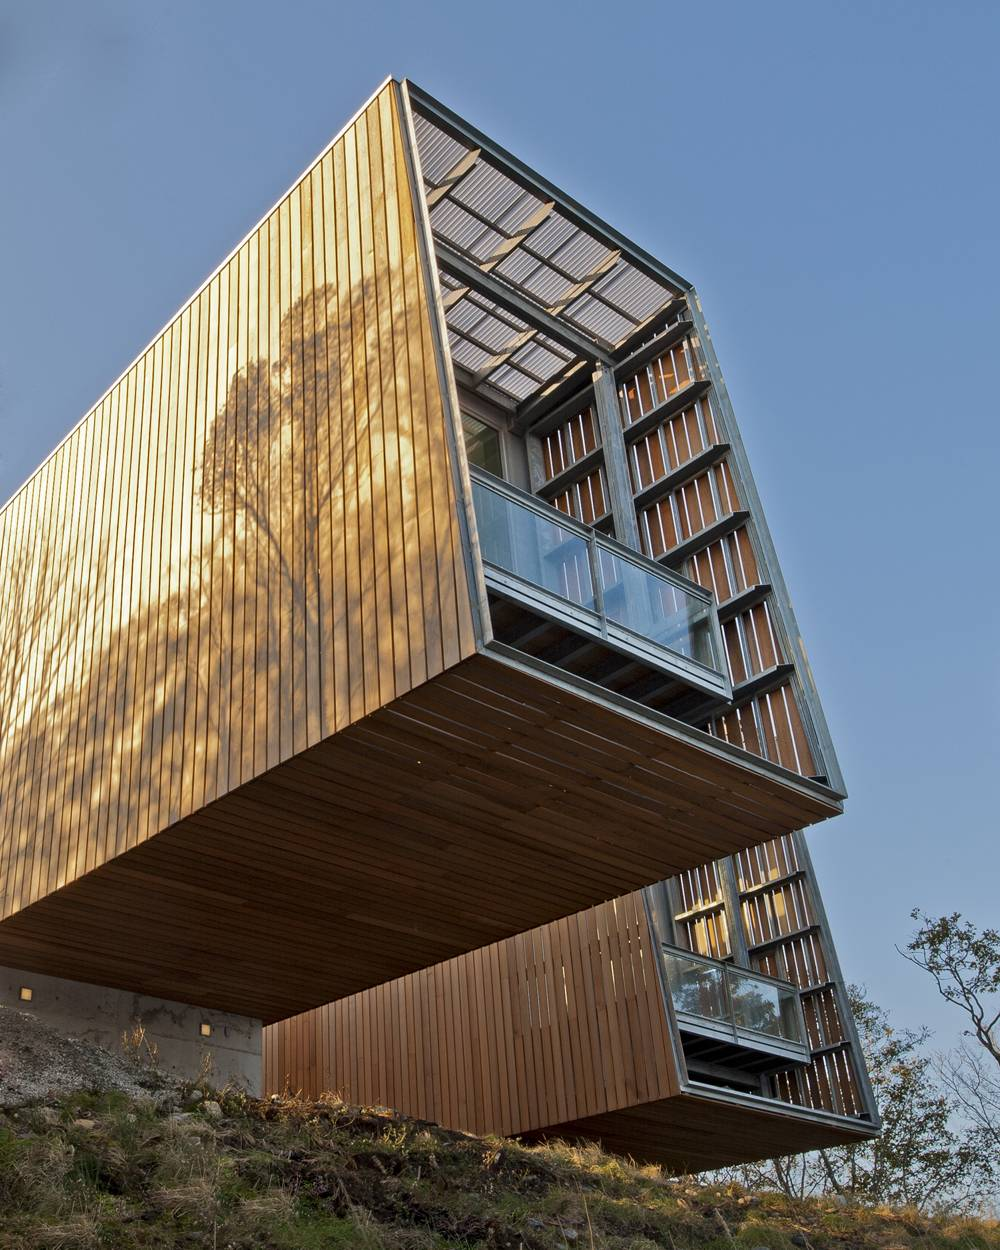 1455981285_cantilever-balcony-design-ideas-2.jpg